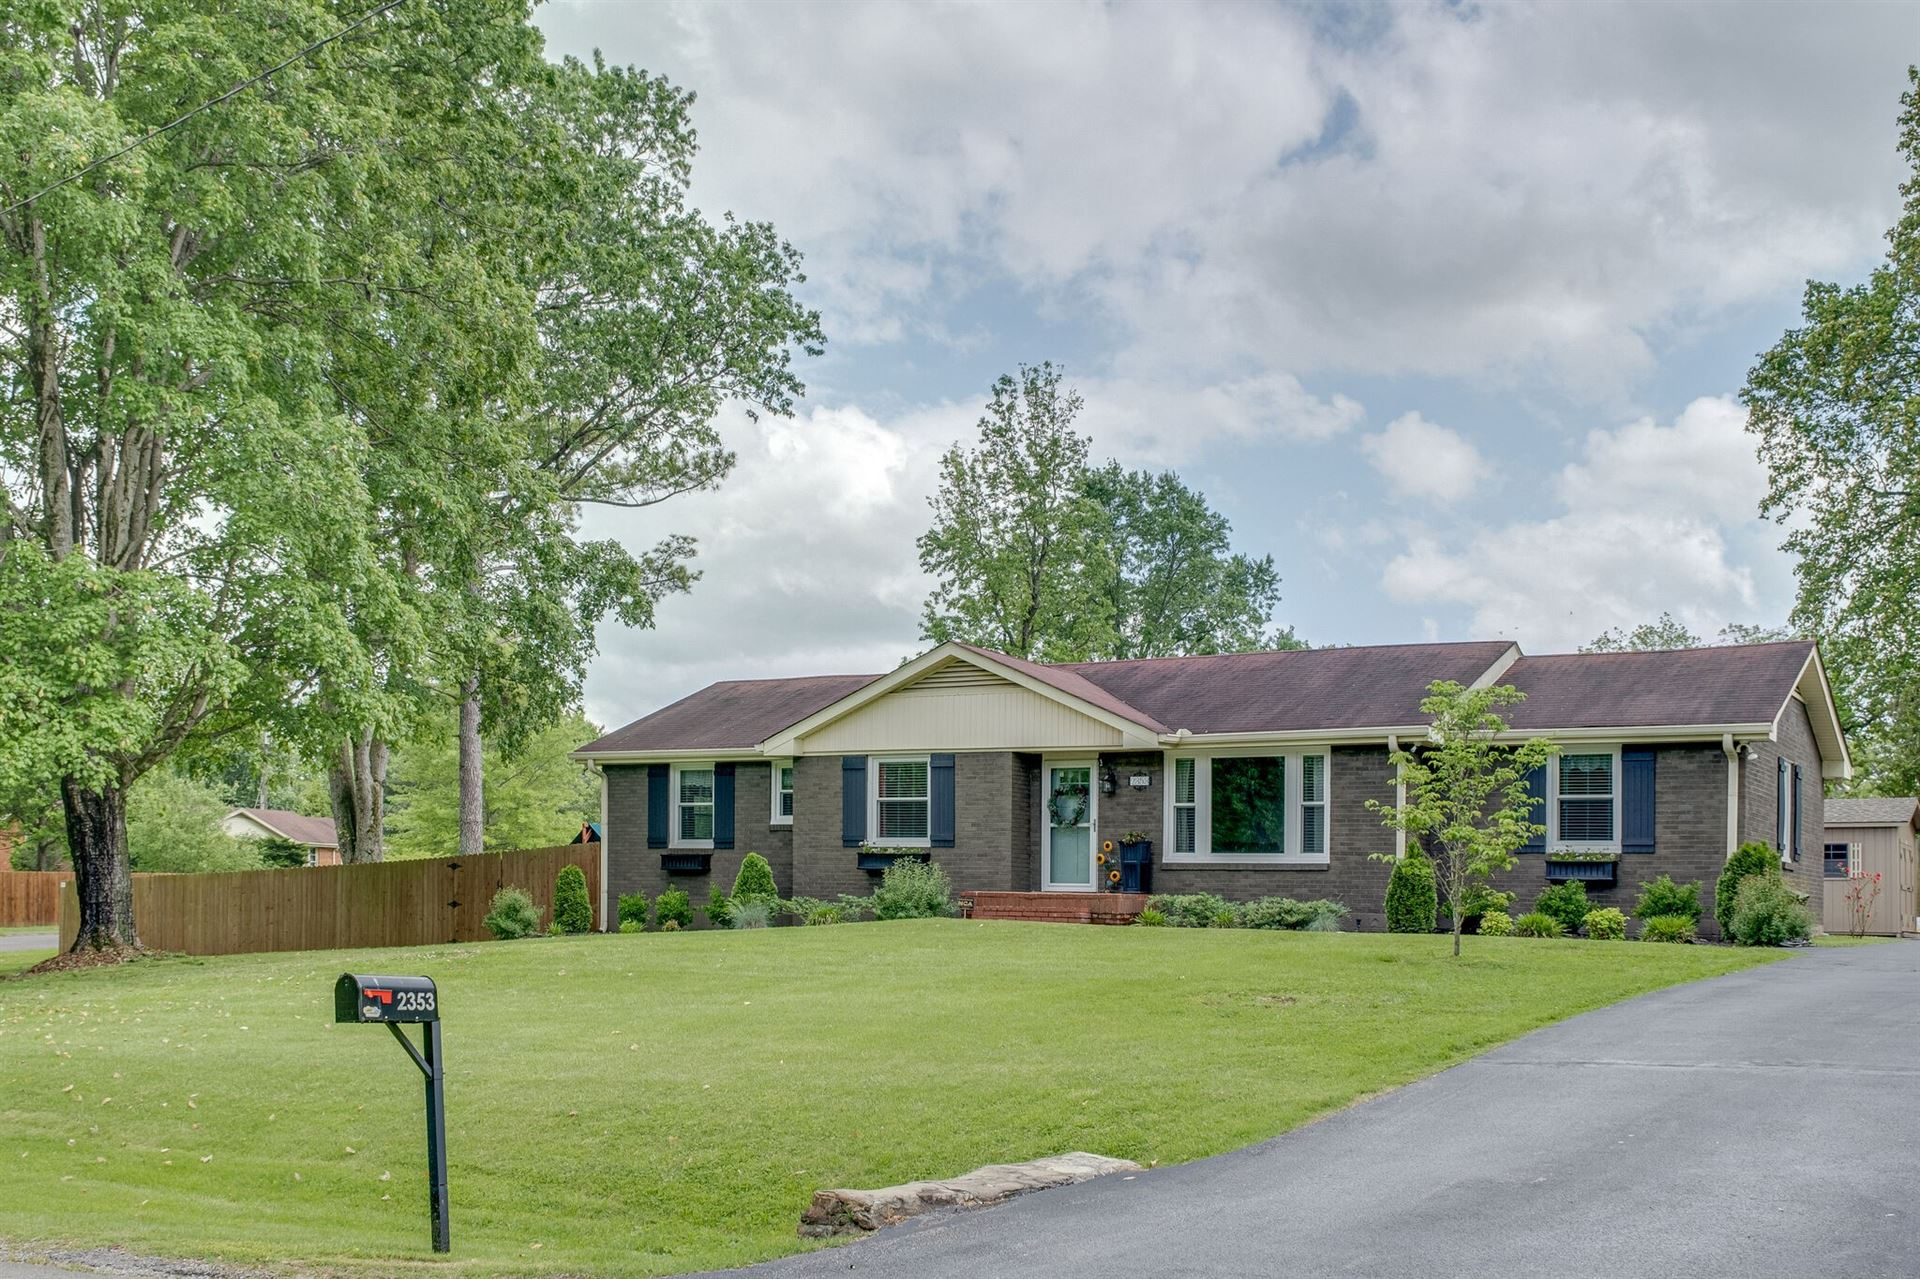 Photo of 2353 Ridgeland Dr, Nashville, TN 37214 (MLS # 2253592)